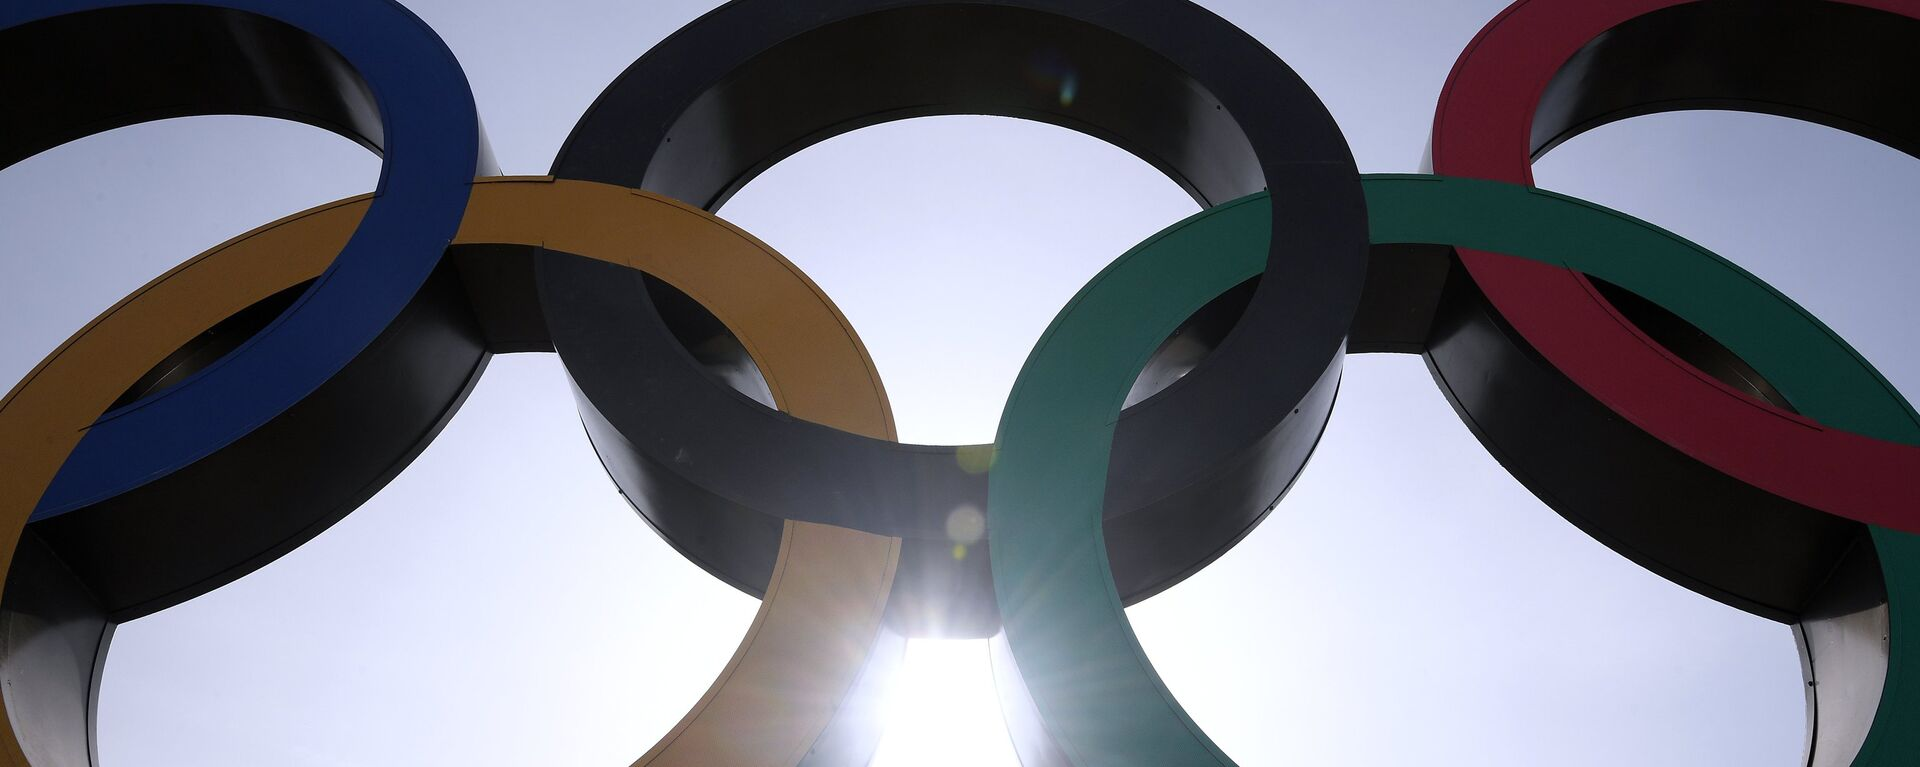 Олимпийский символ, архивное фото - Sputnik Латвия, 1920, 14.11.2018